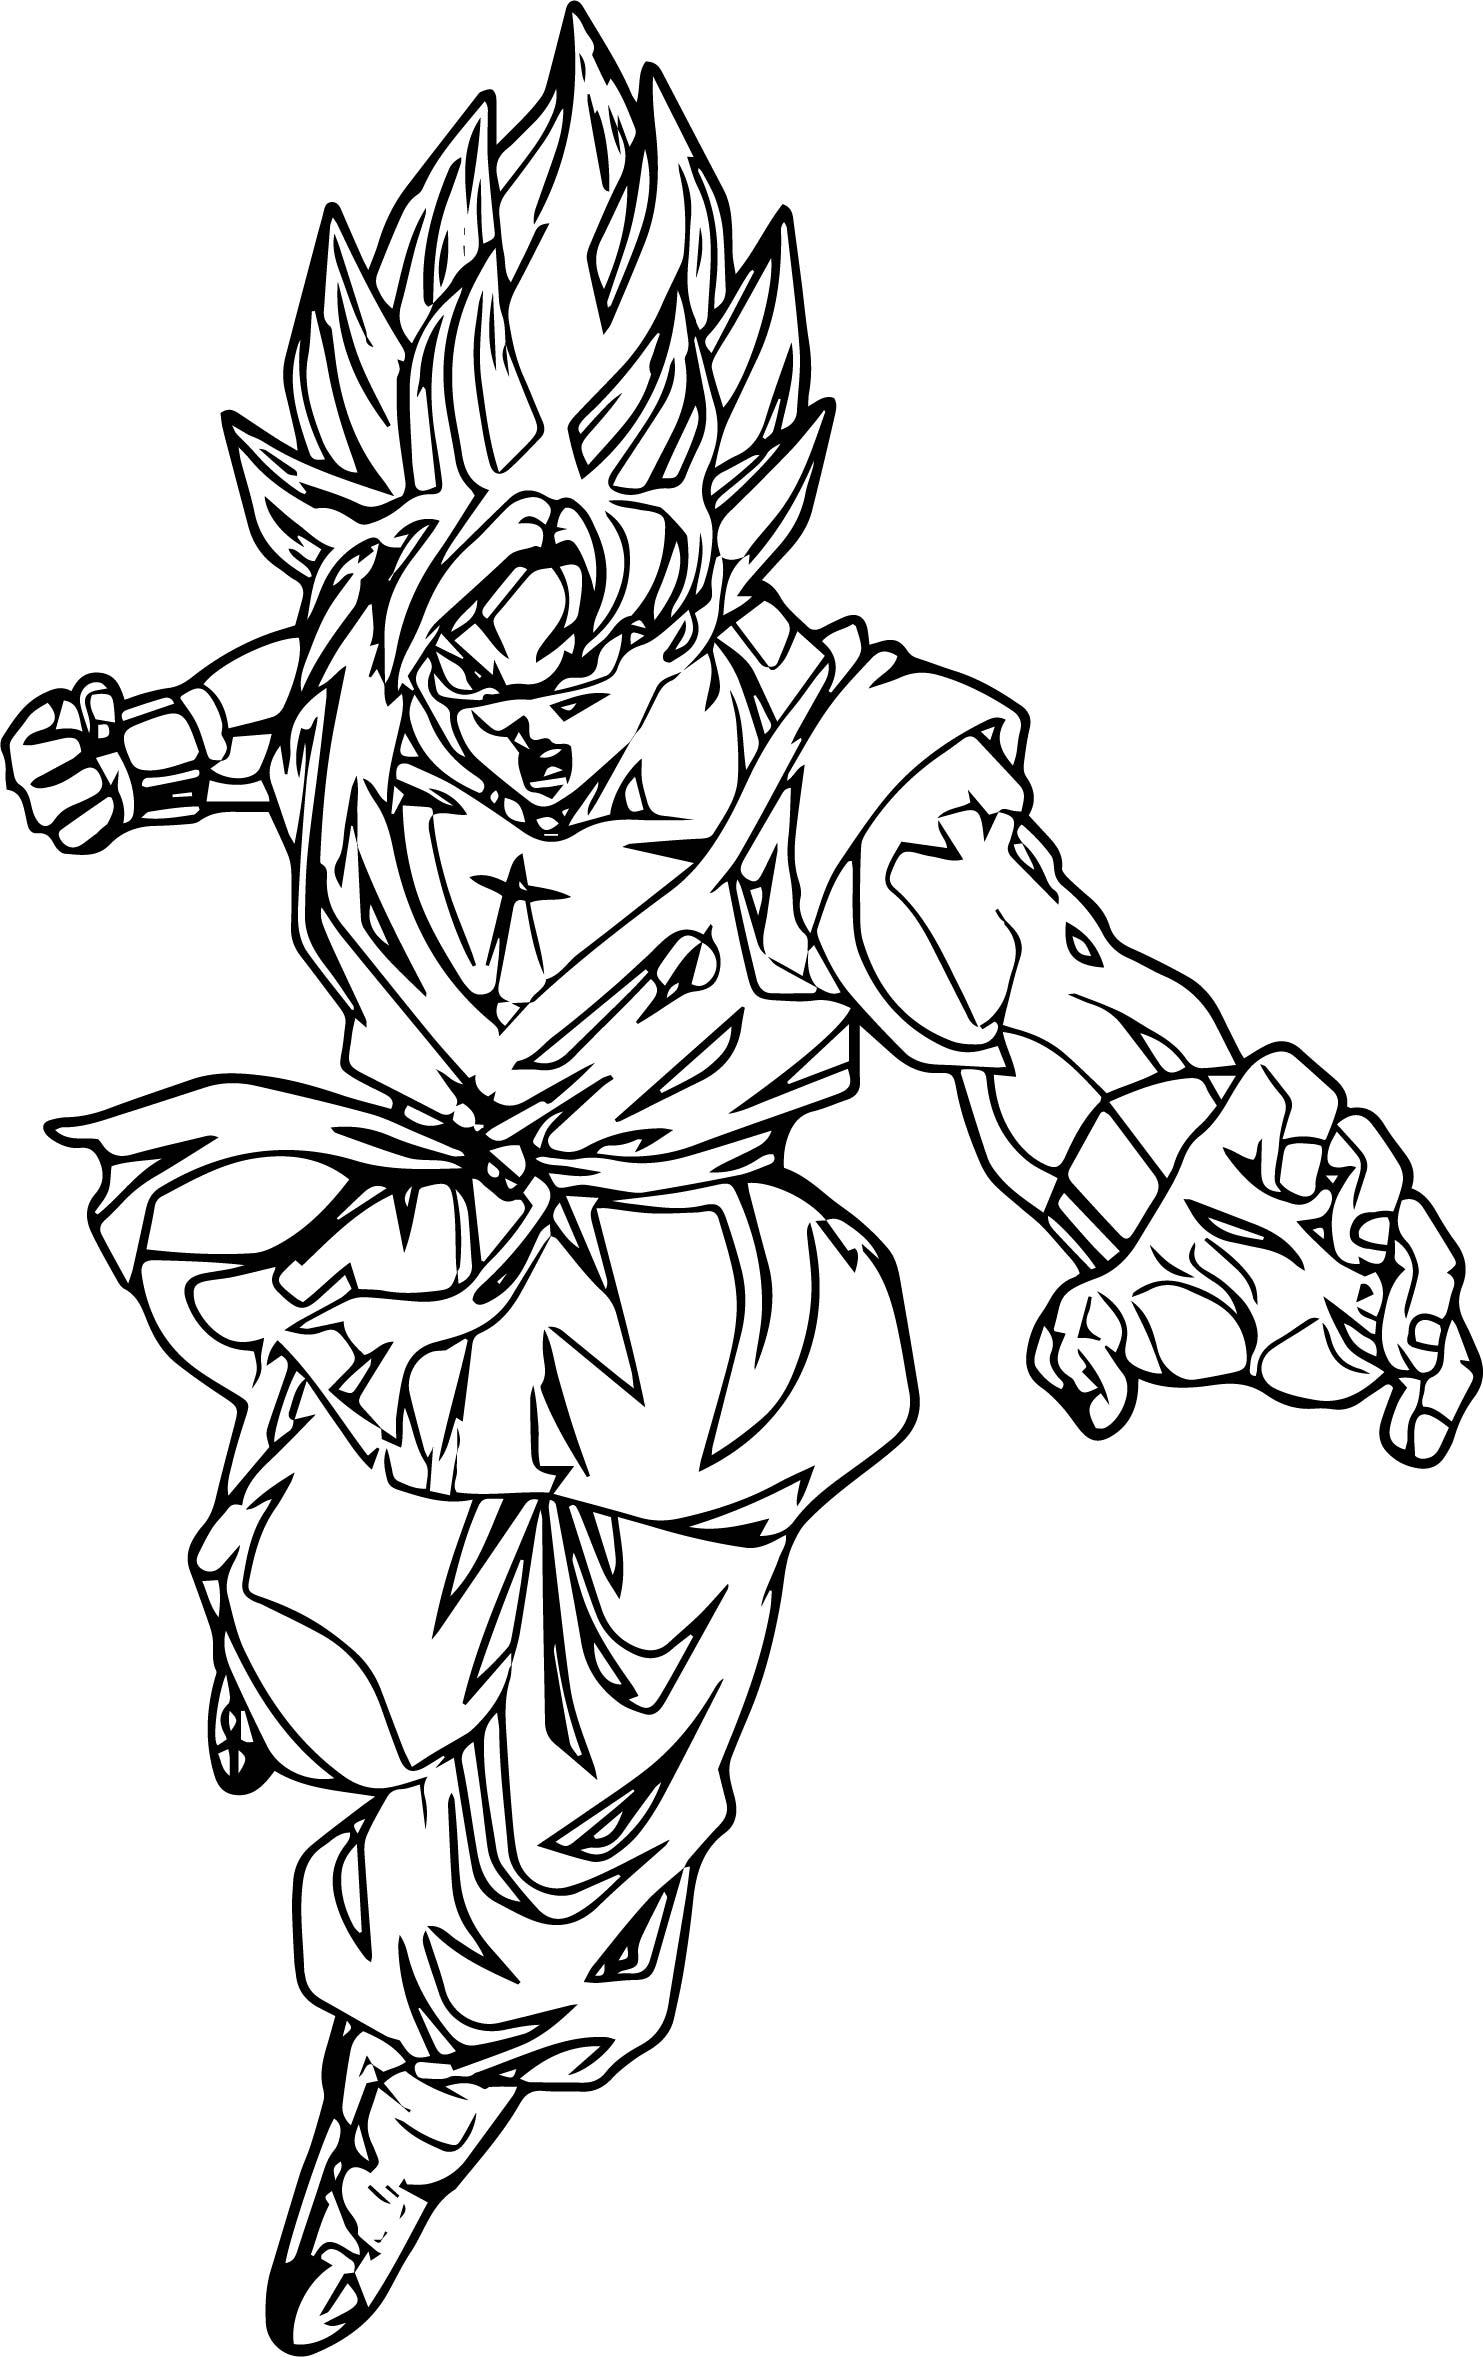 Goku We Coloring Page 037